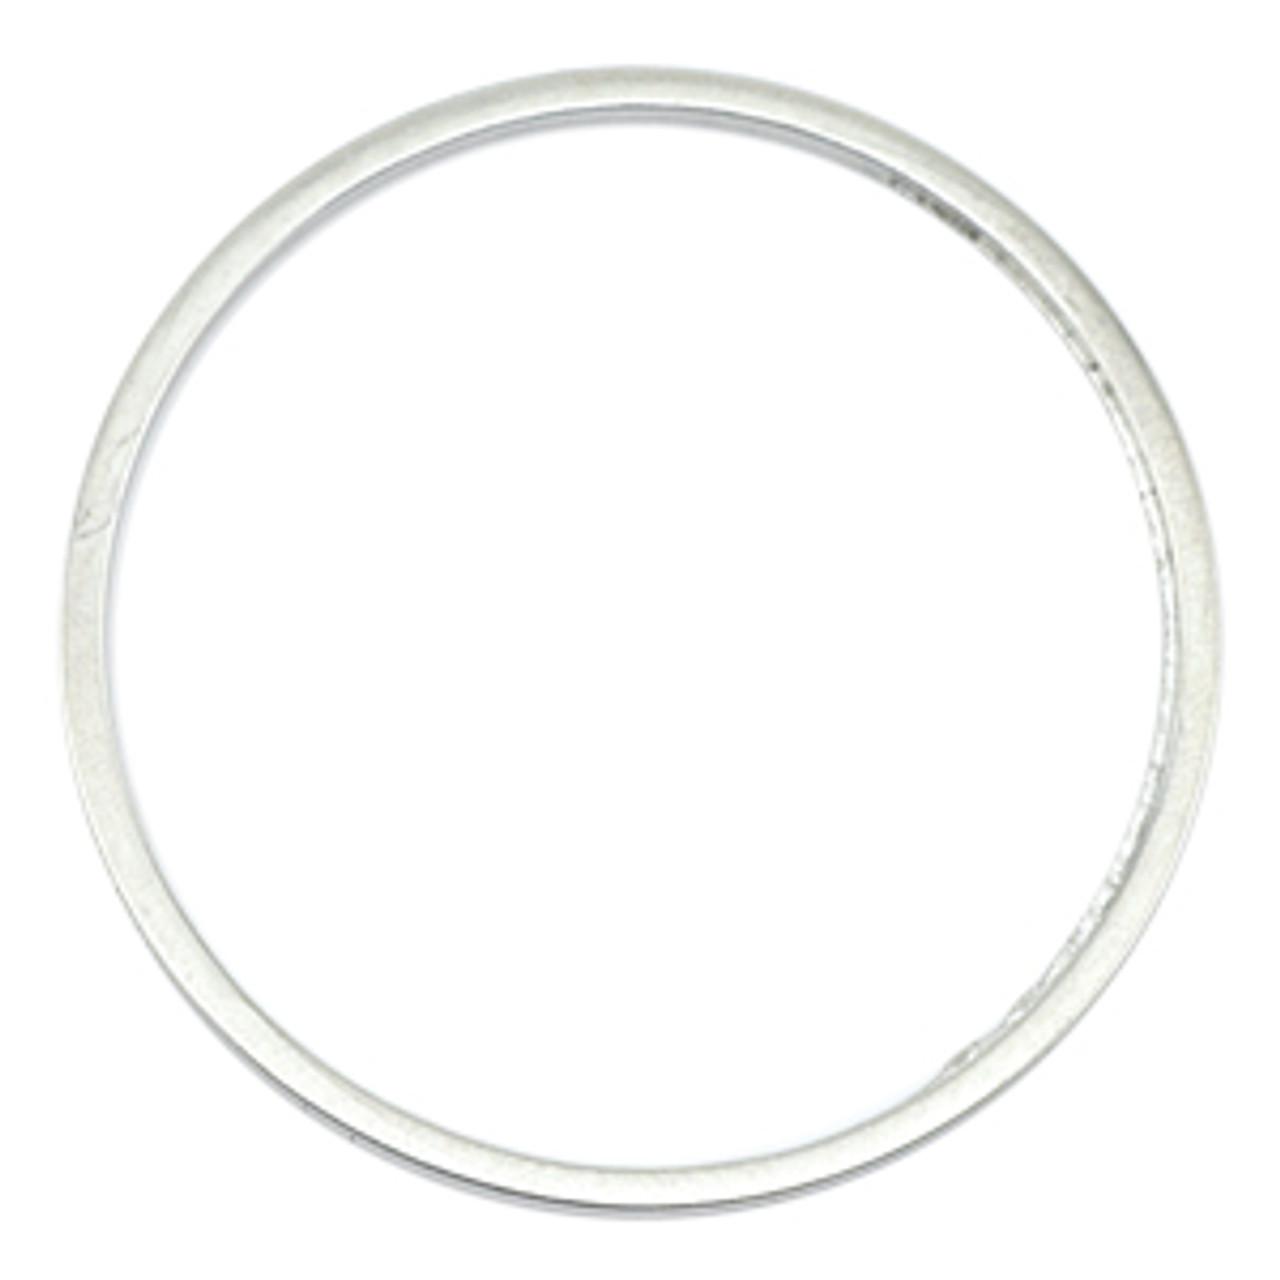 25mm Solid Rings Beadalon